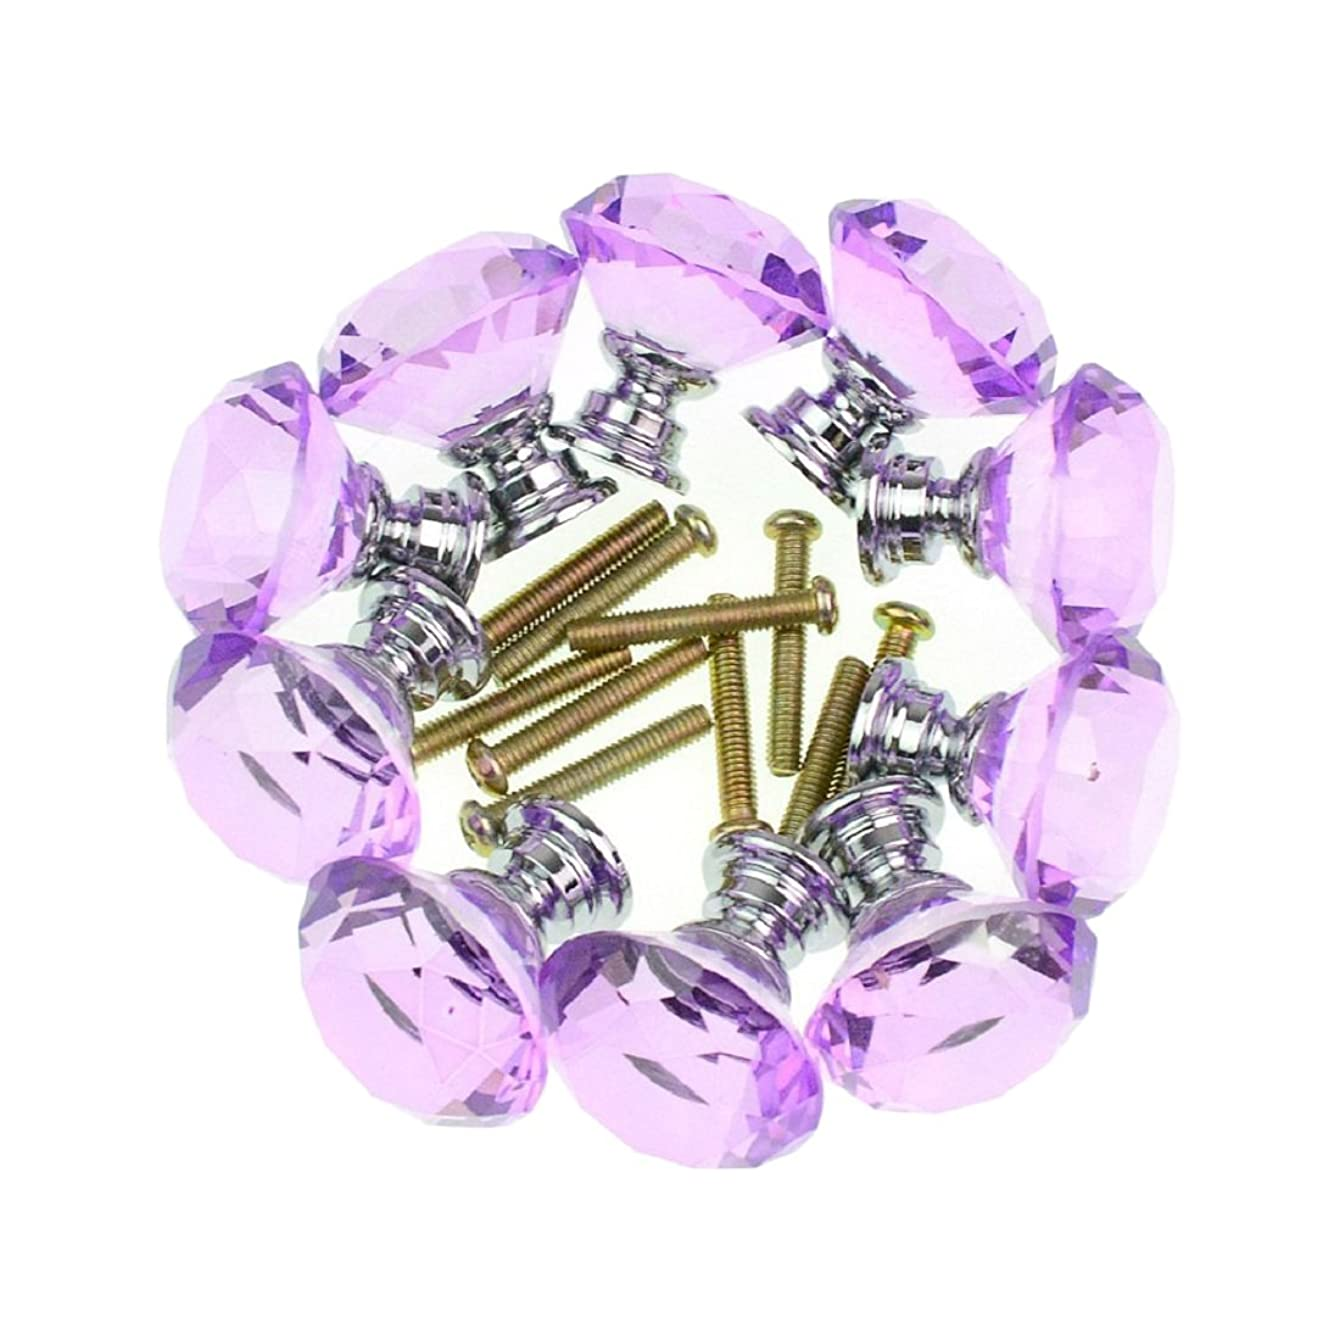 Drawer Pulls , YIFAN Set of 10 Door Knobs 30mm Diamond Shape Glass Handles for Home Office Cabinet Cupboard Bonus Silver Screws DIY- Lavender